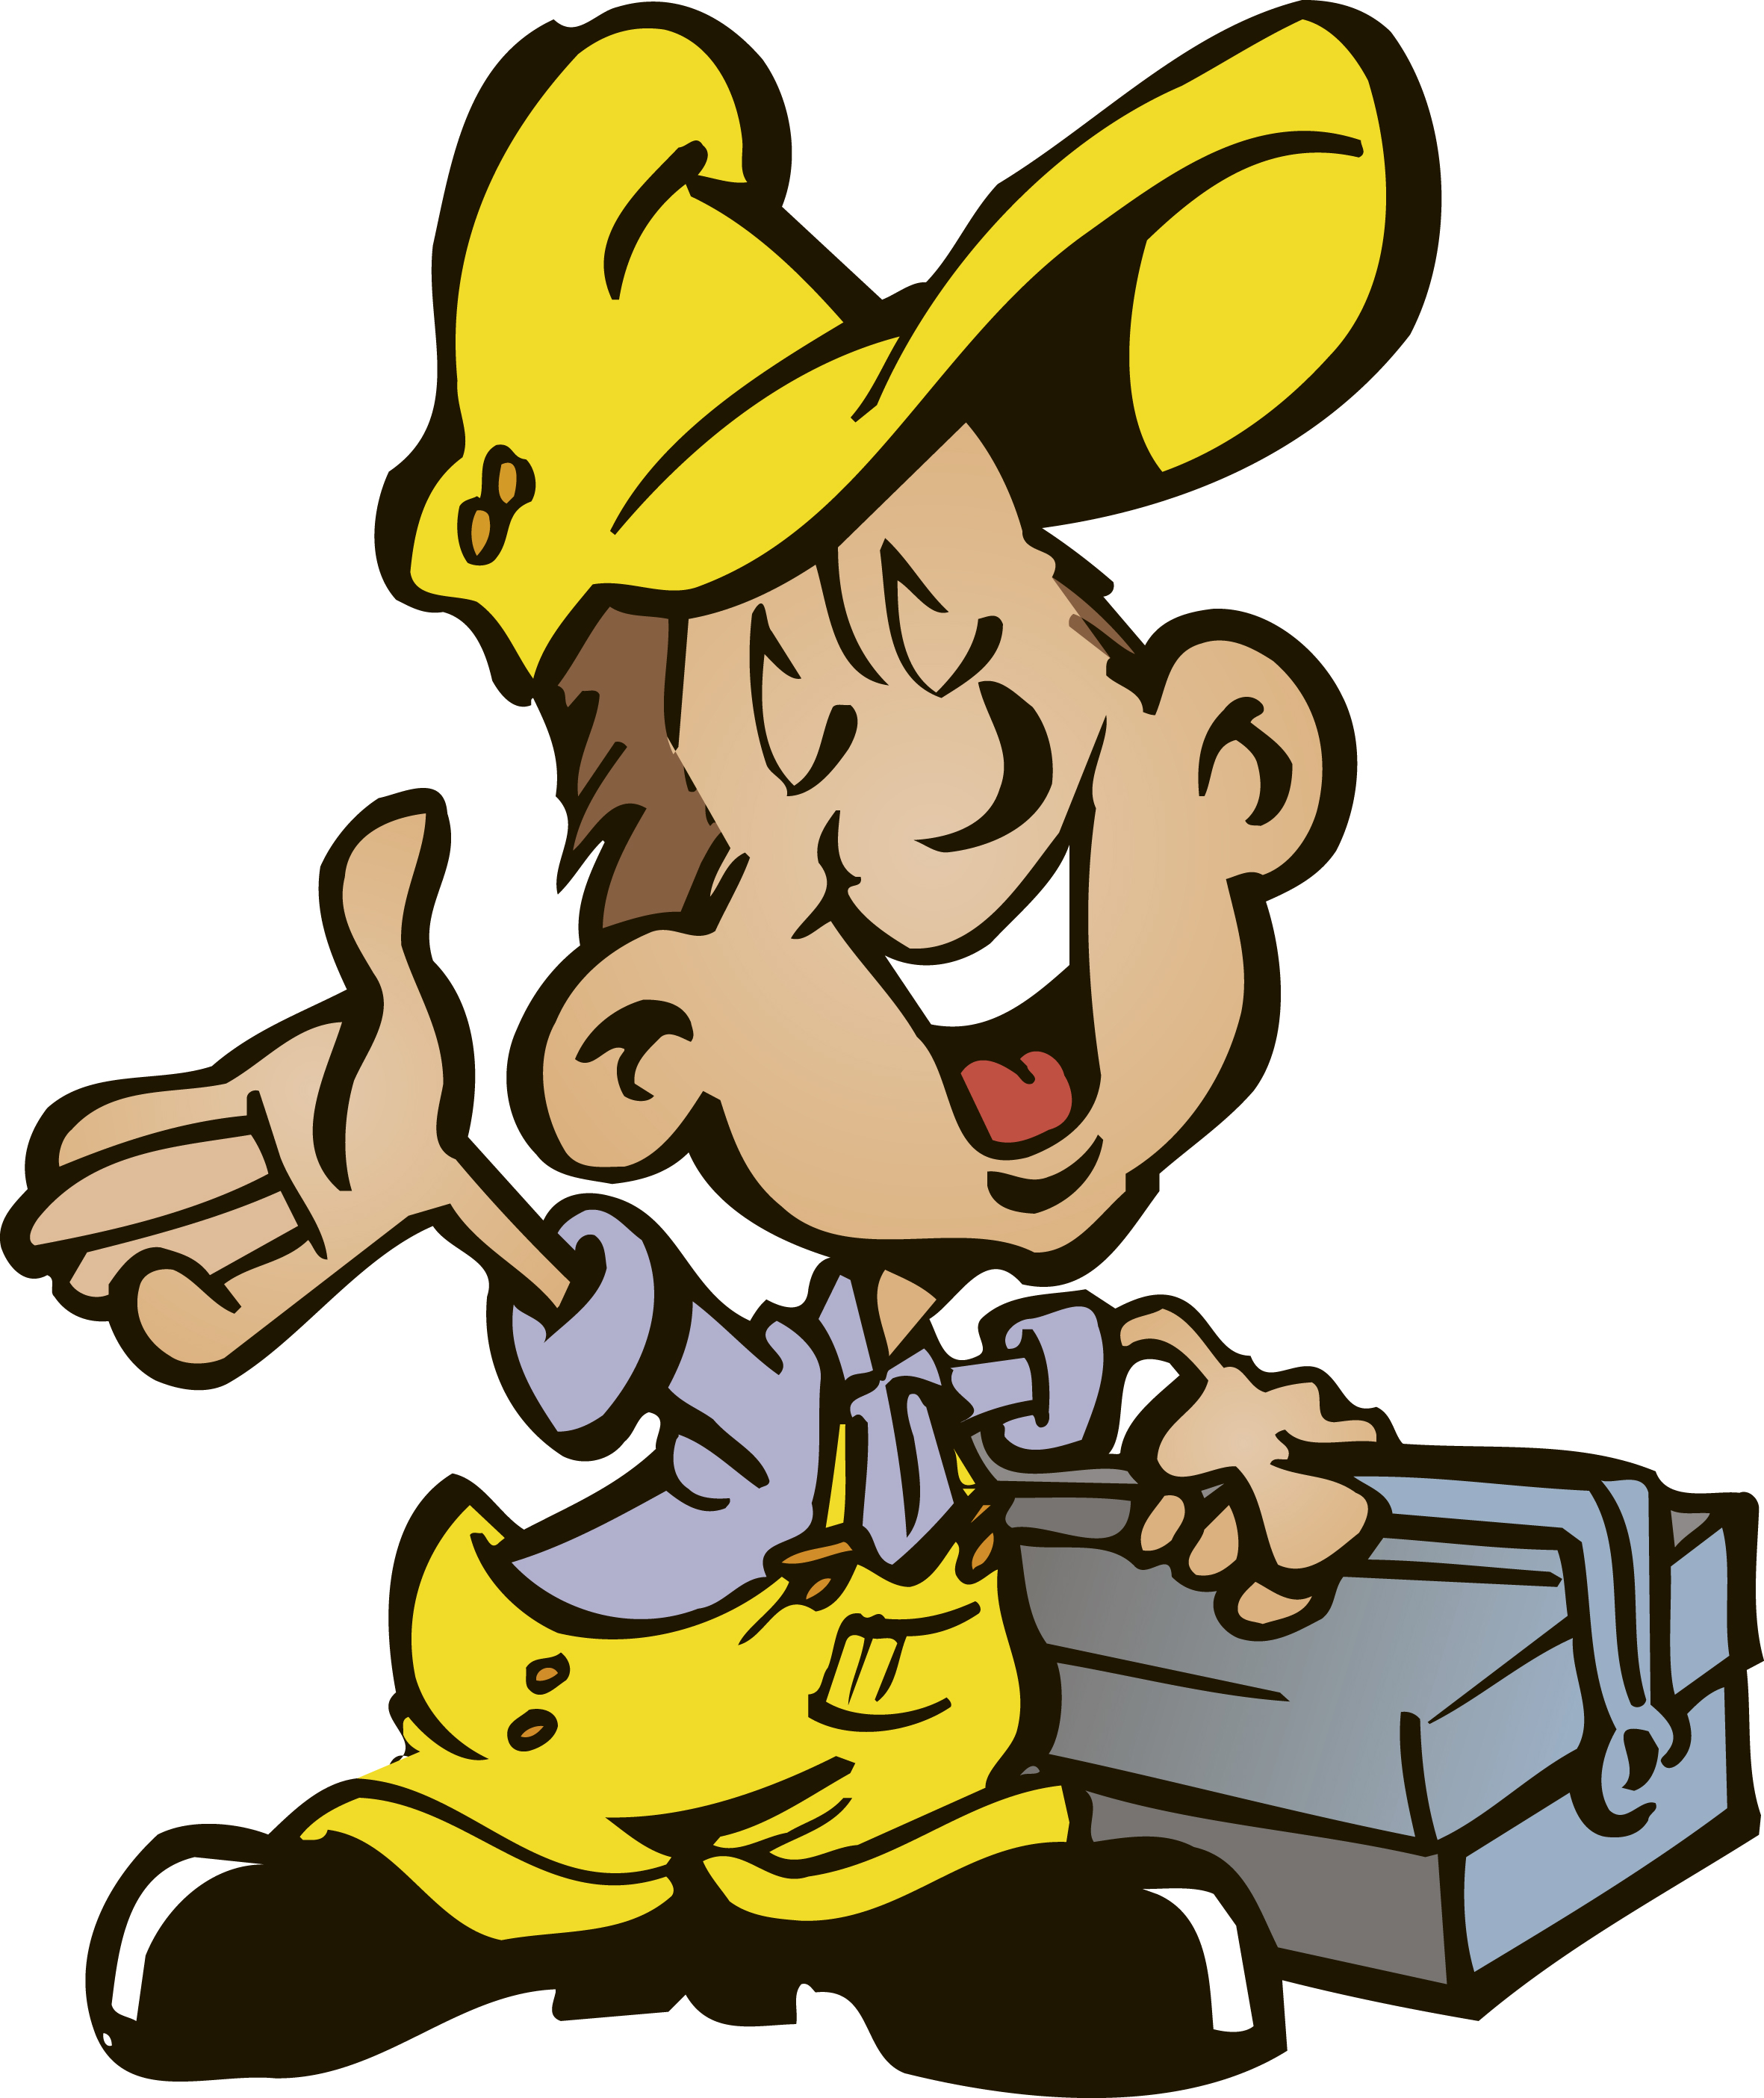 Handyman clip art free download clipart images 4